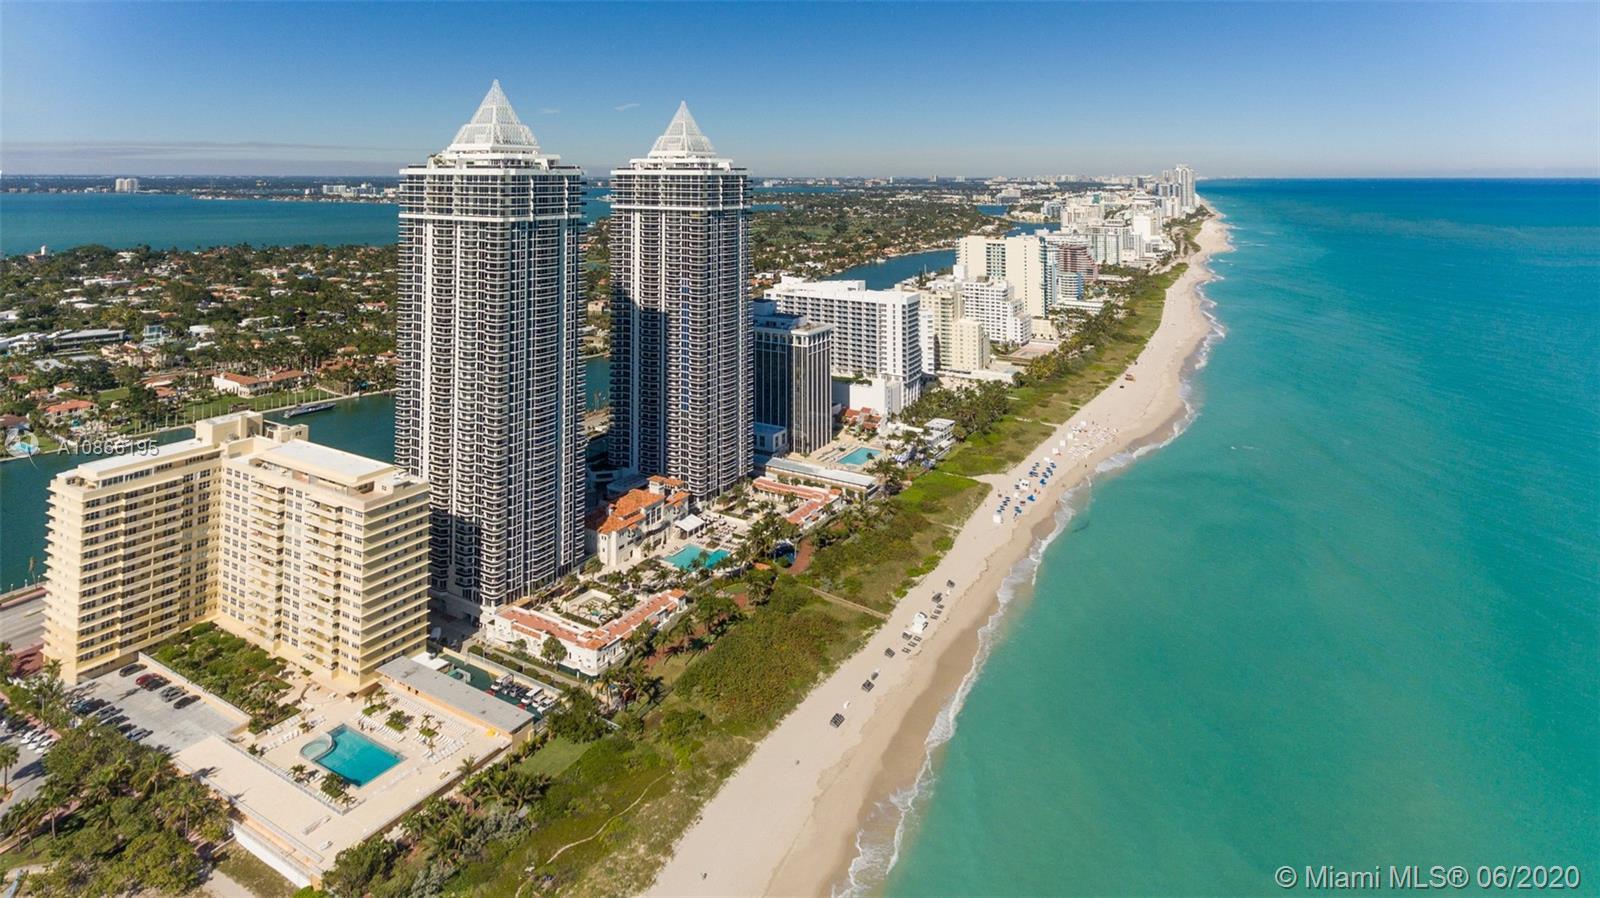 Green Diamond #CA-D28 - 4775 COLLINS AV #CA-D28, Miami Beach, FL 33140